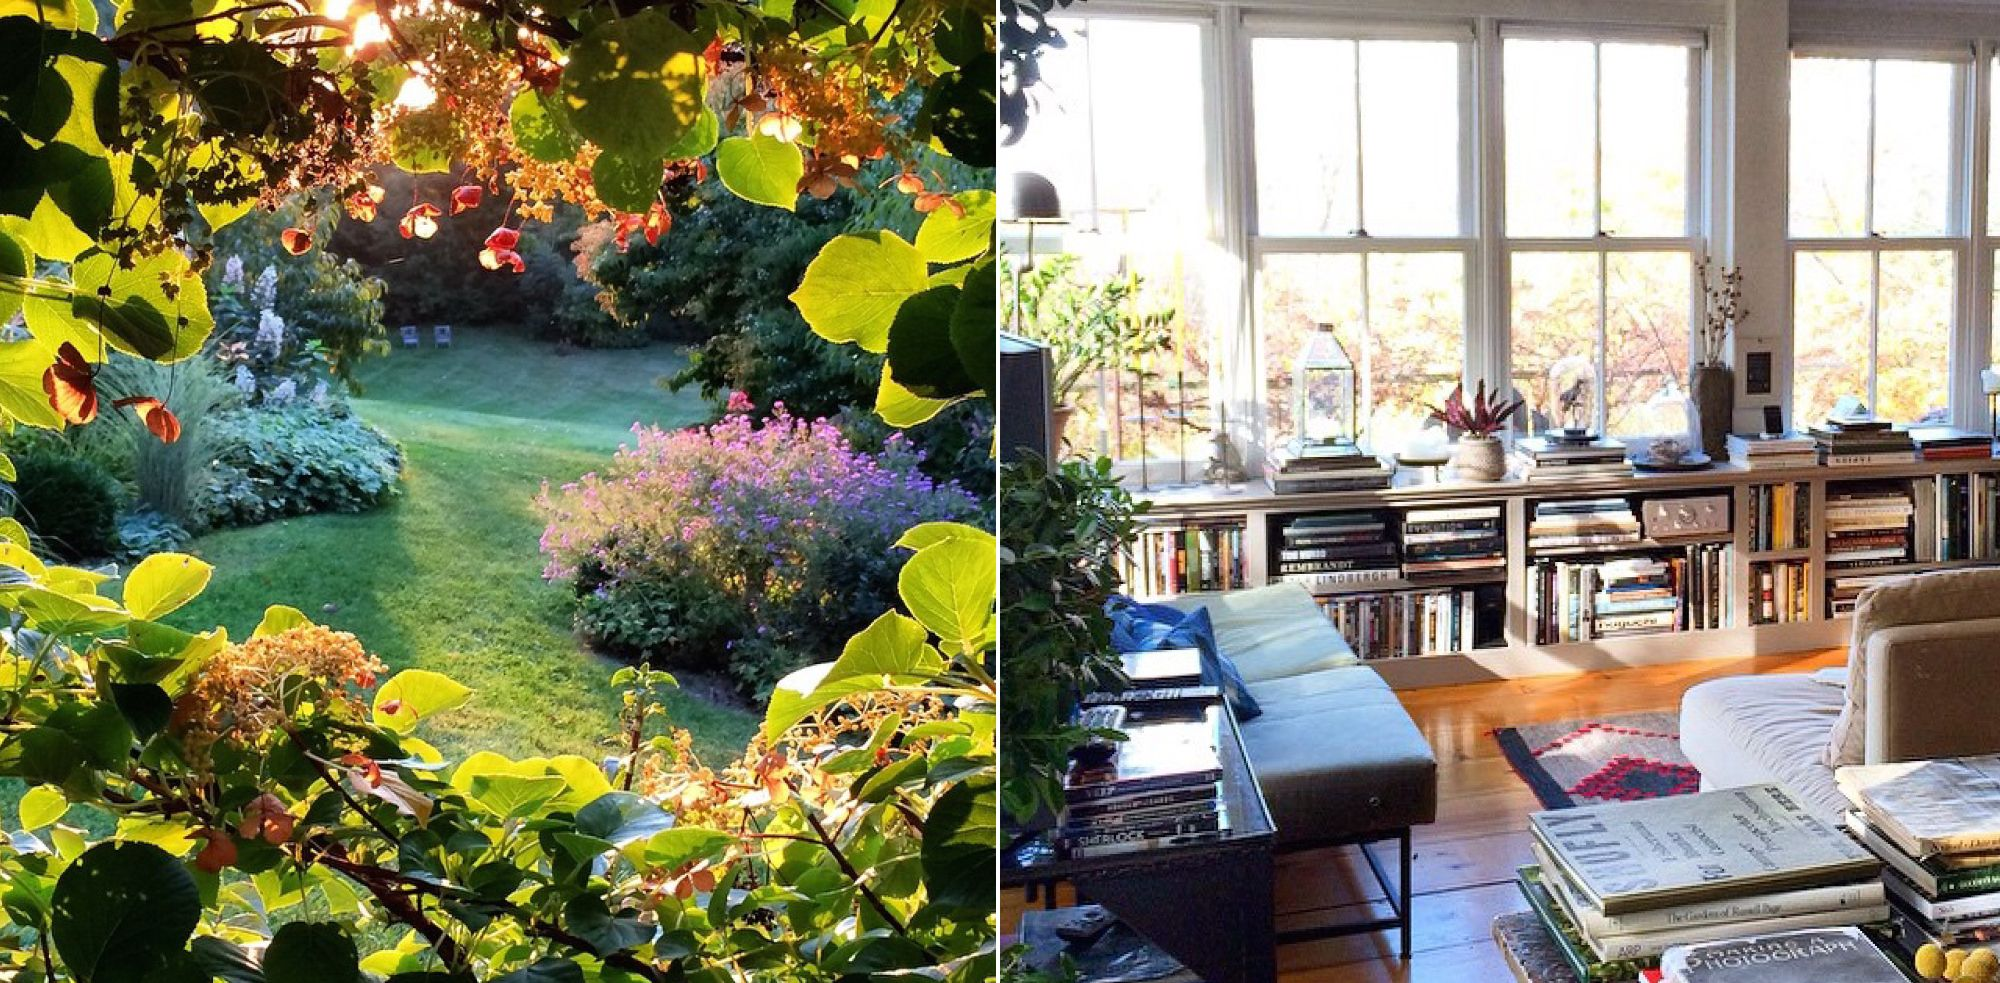 Lyndale House Inspiration: Frank Muytjens' HillsdaleHome - images from Frank Muytjens' inspiring instgram feed (@fmuytjens)